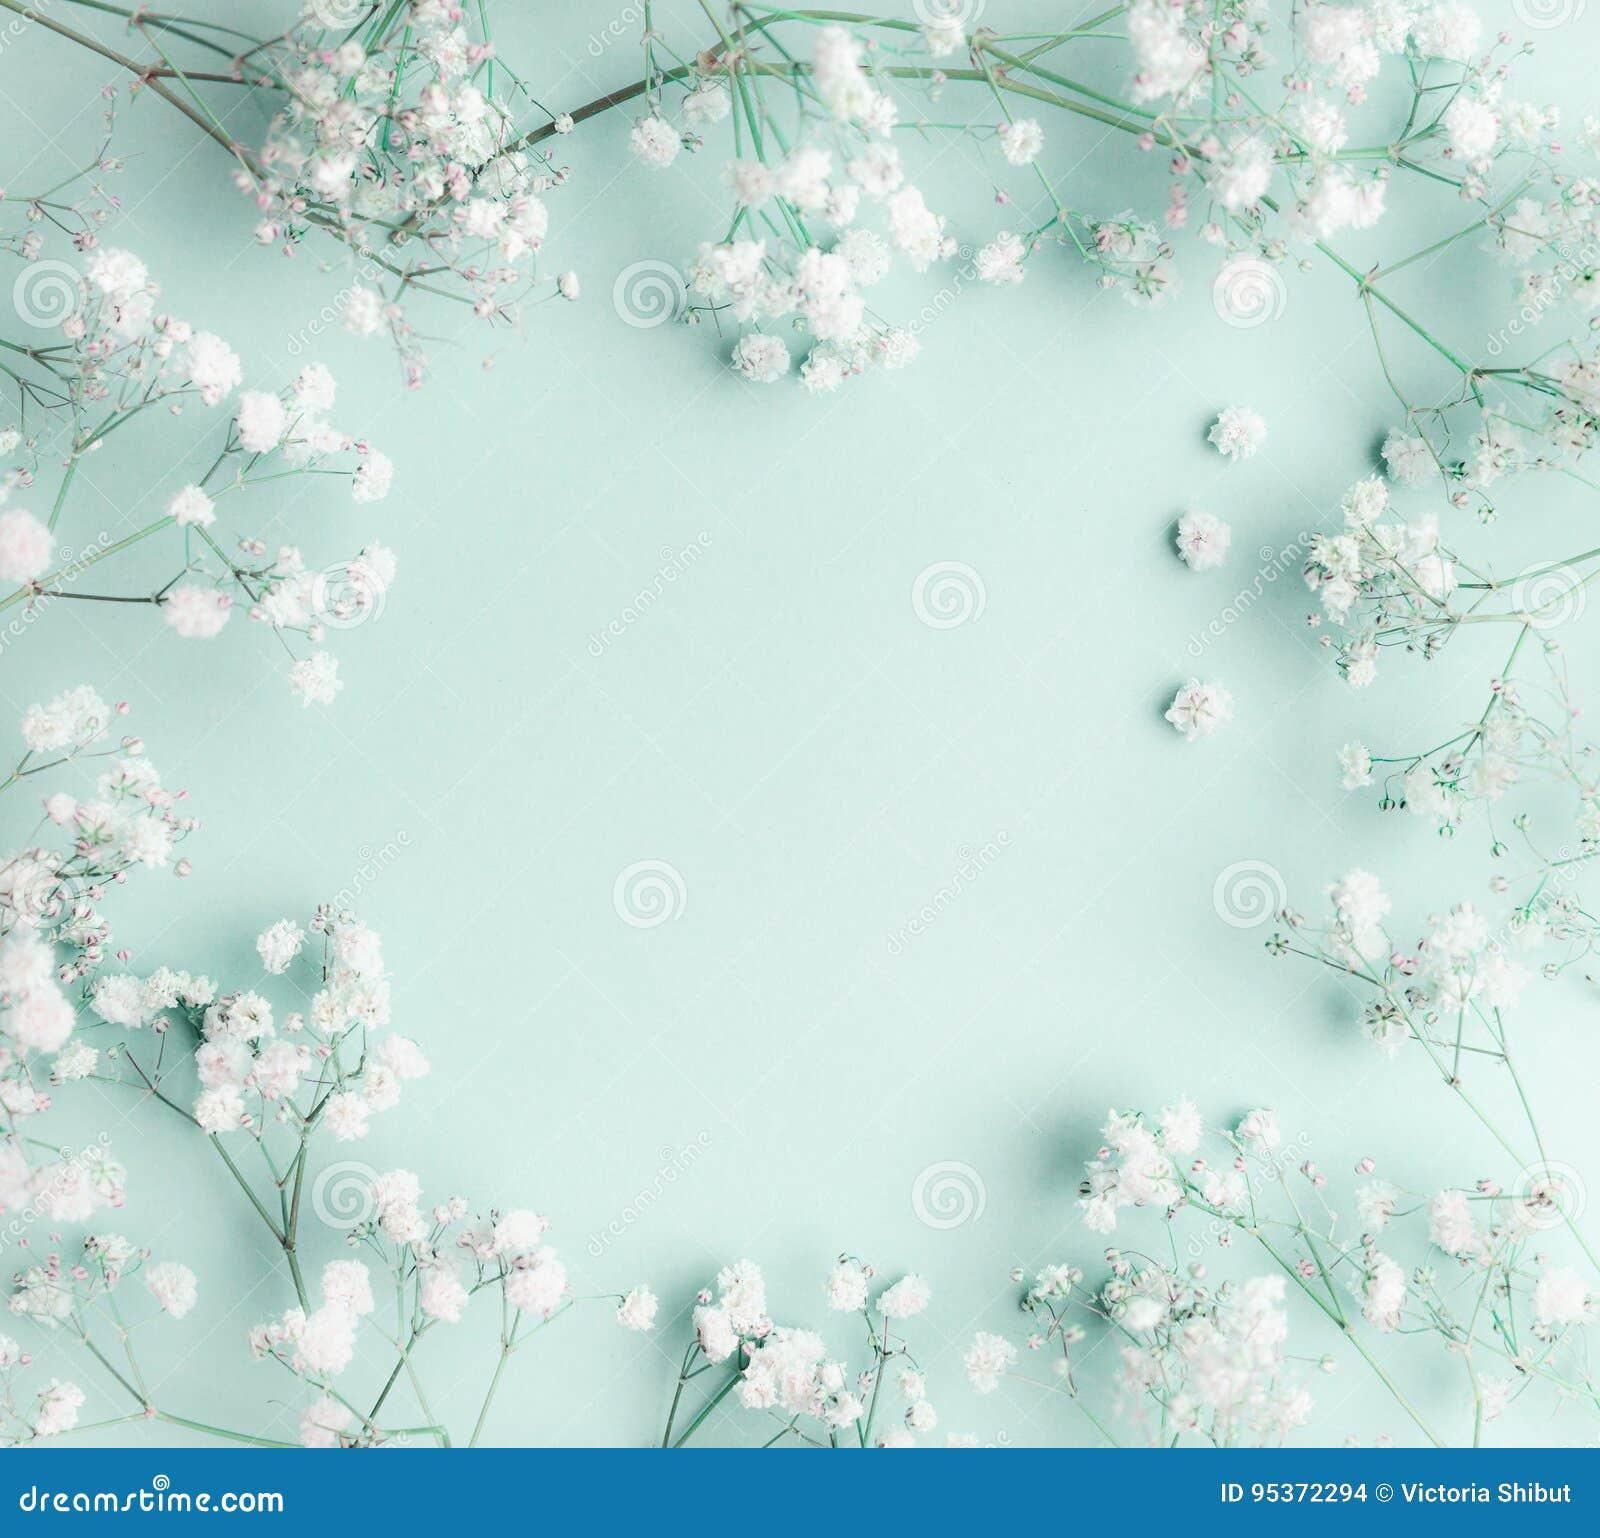 Floral σύνθεση με τις ελαφριές, αερώδεις μάζες των μικρών άσπρων λουλουδιών στο τυρκουάζ μπλε υπόβαθρο, τοπ άποψη, πλαίσιο